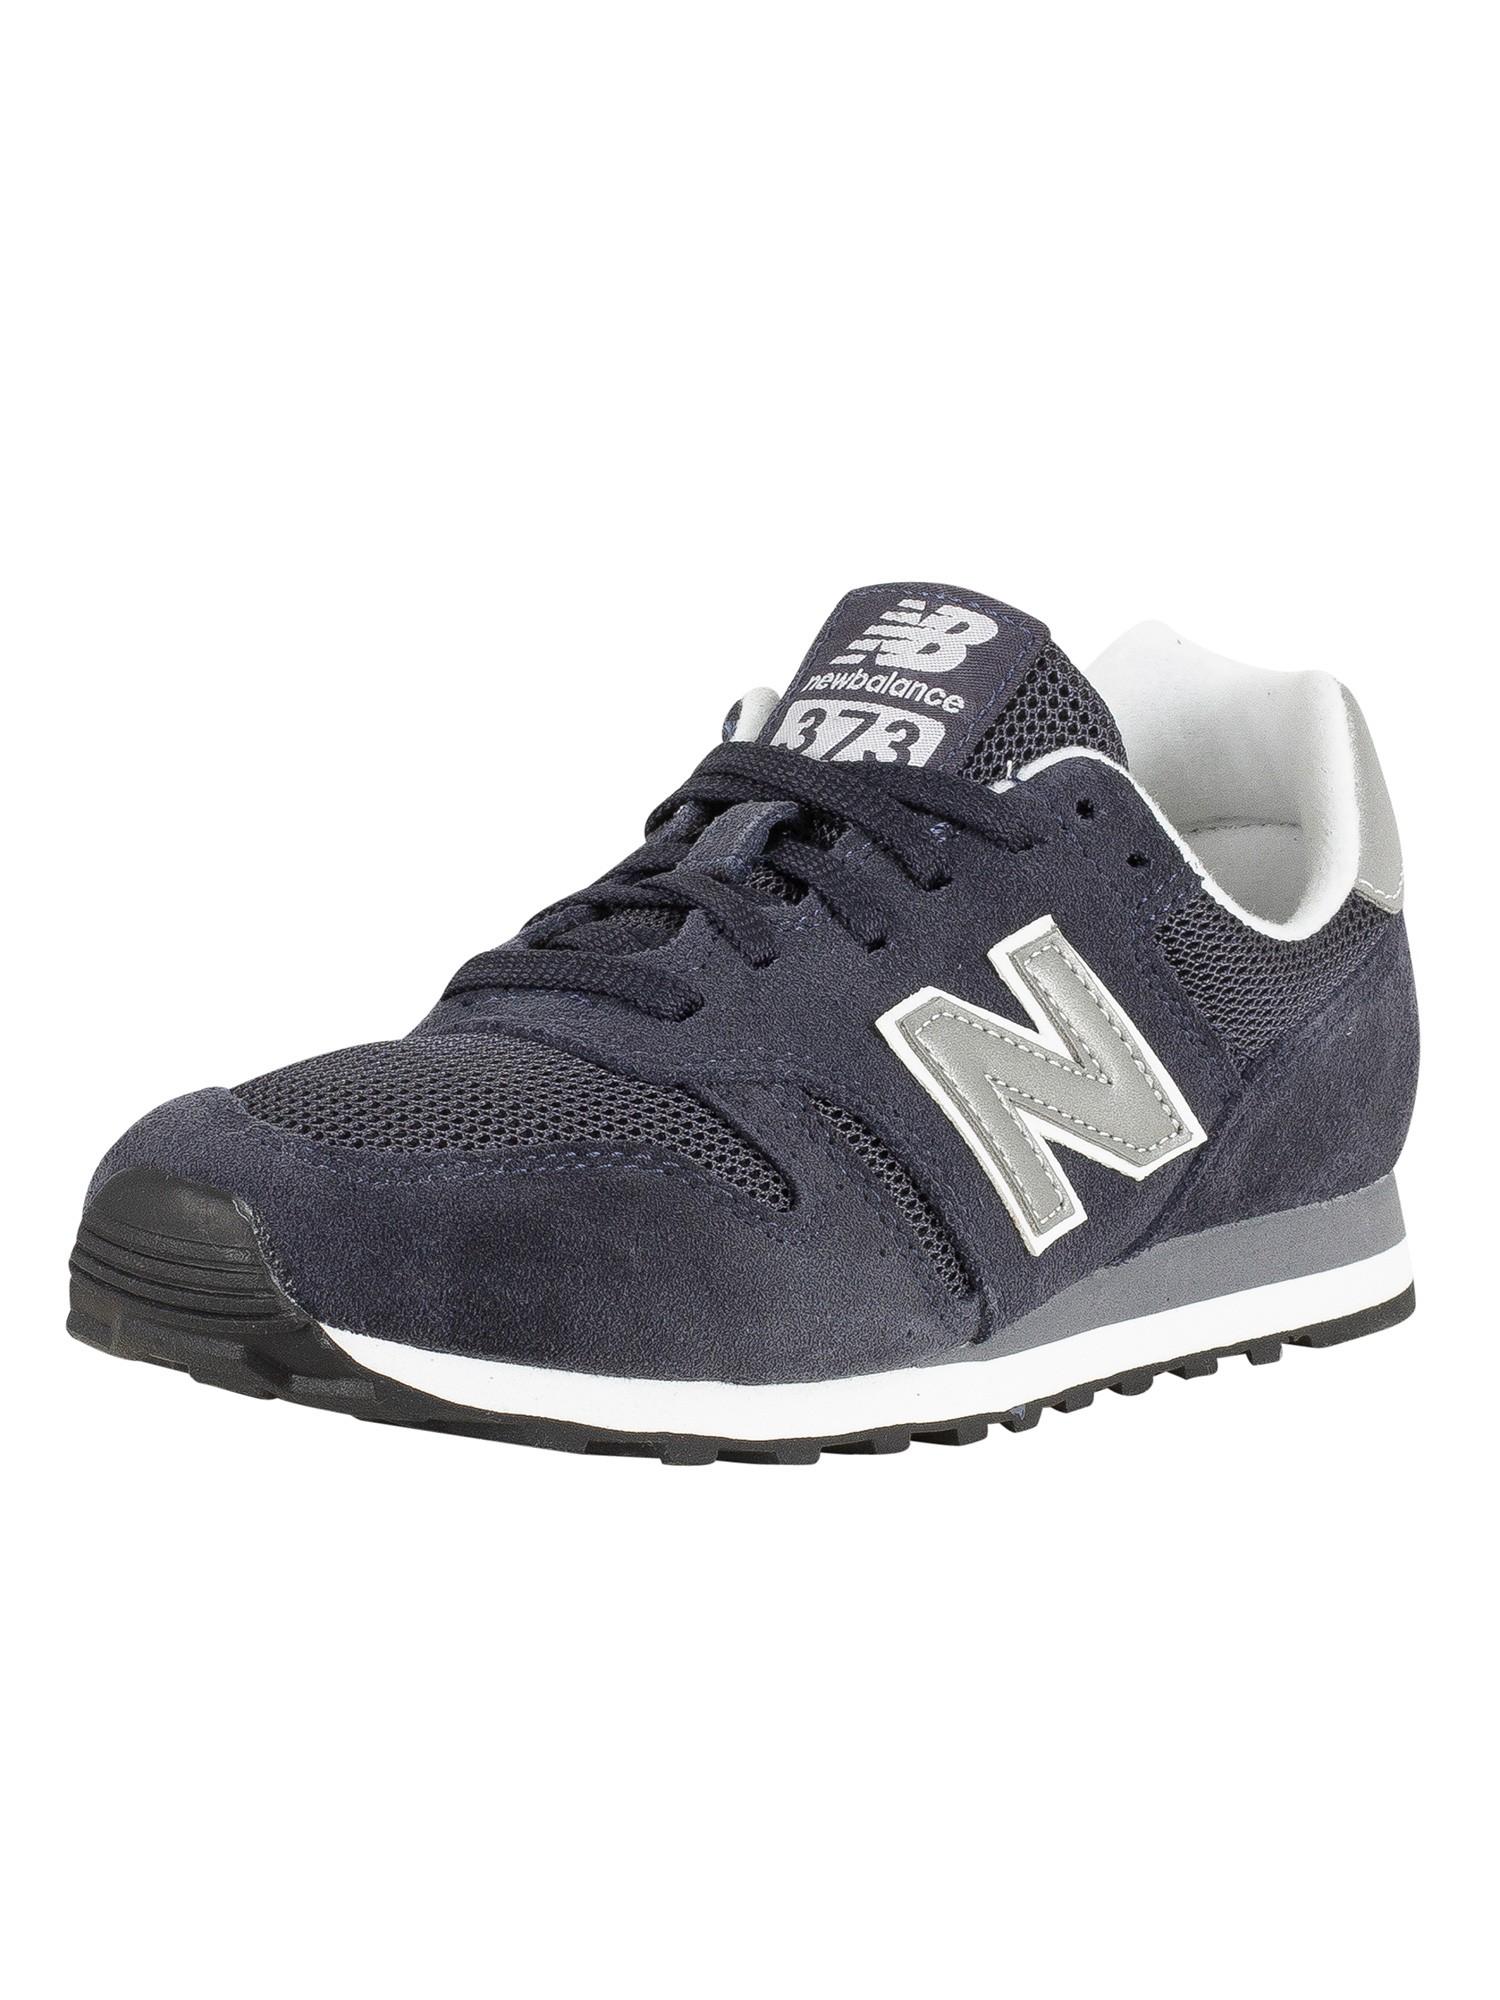 373 new balance navy